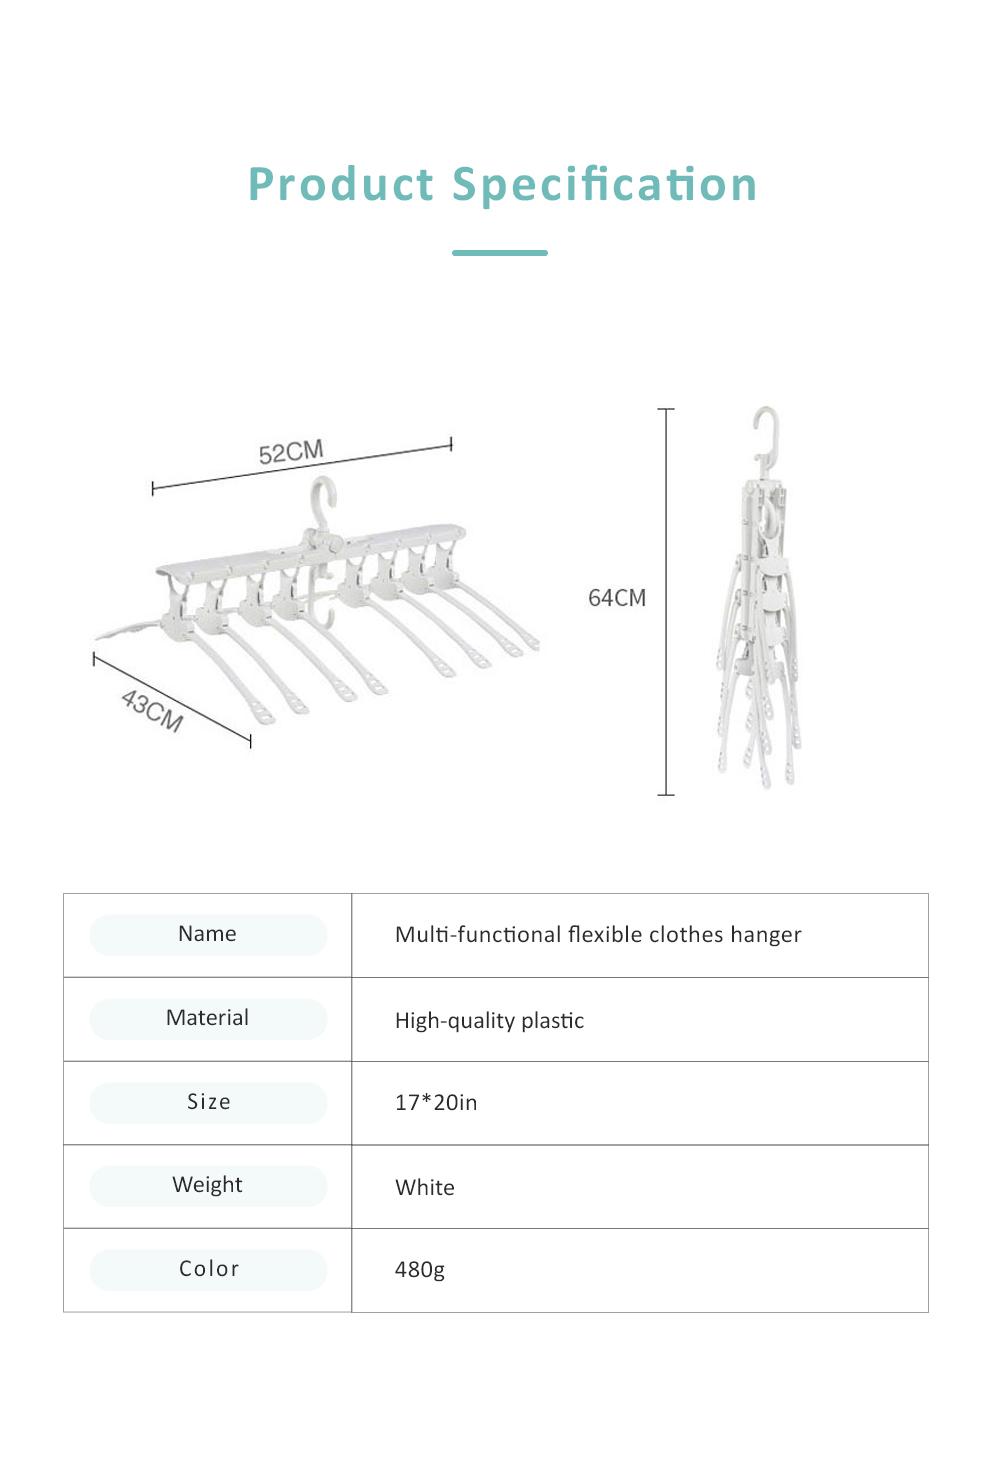 3 Pack Foldable Plastic Clothes Hanger, Multi-functional Flexible Clothes Rack Storage Set Anti-slip Wind-proof 6